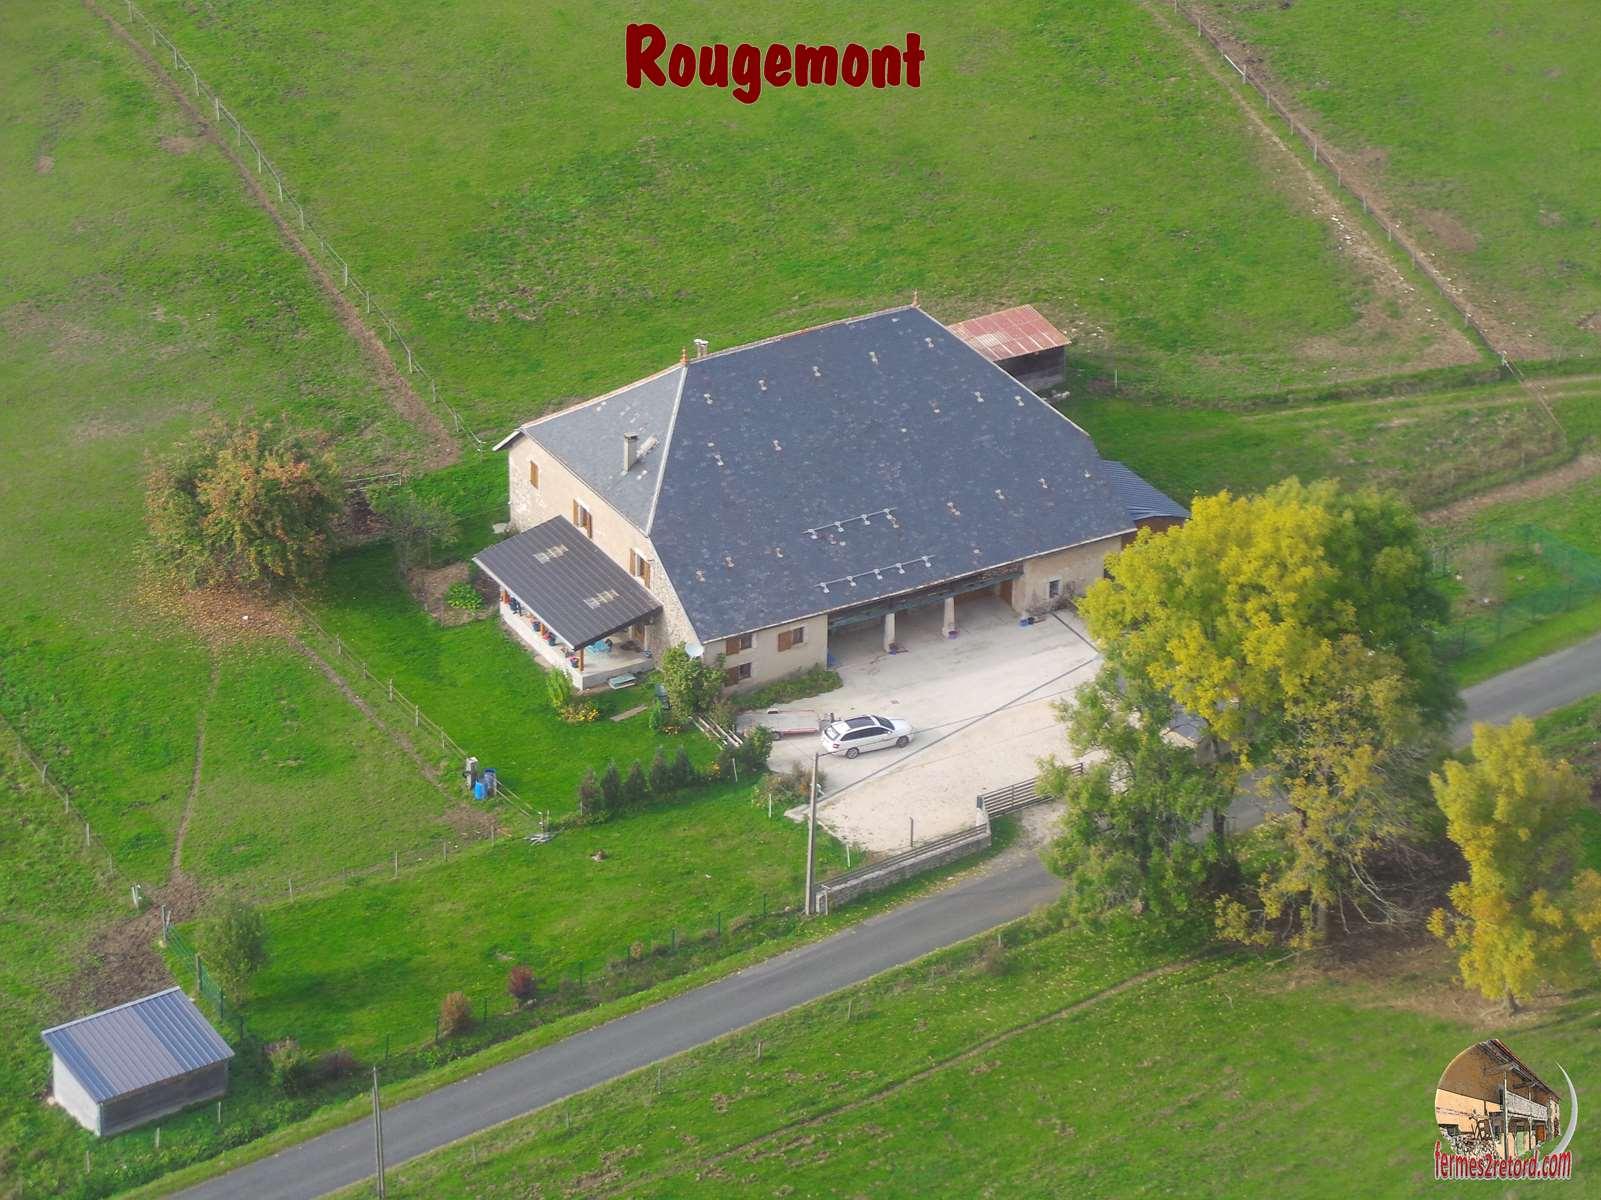 Rougemont.jpg